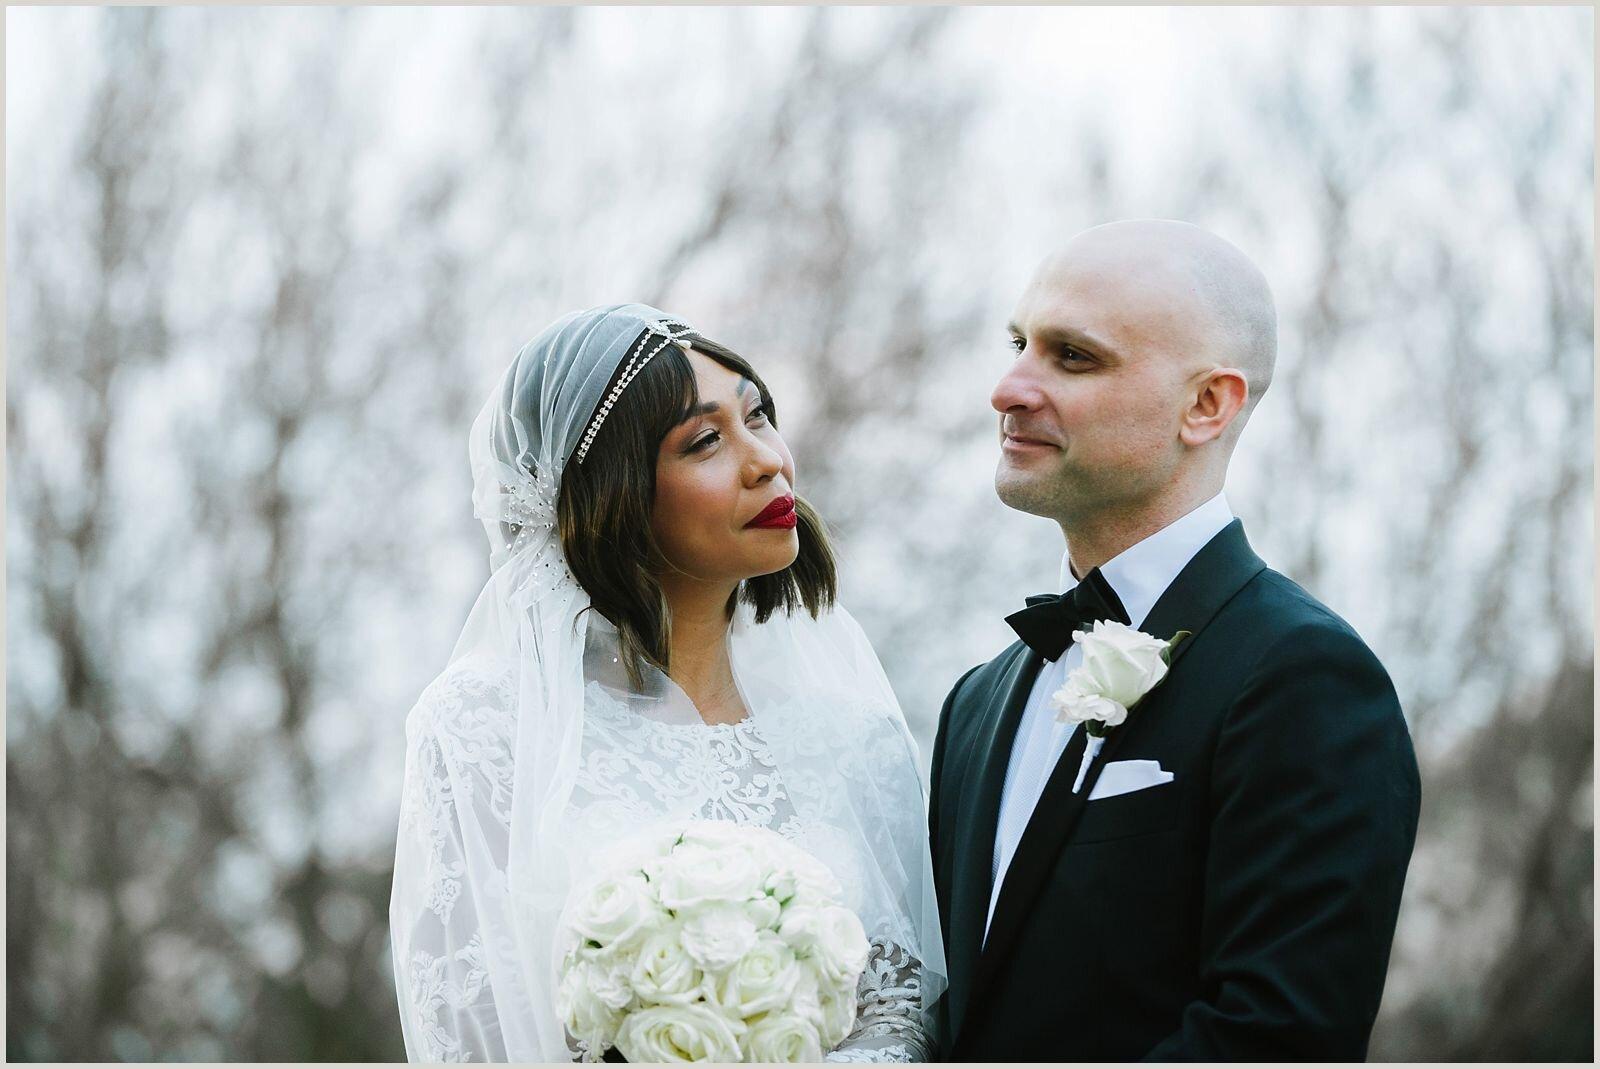 joseph_koprek_wedding_melbourne_the_prince_deck_0057.jpg